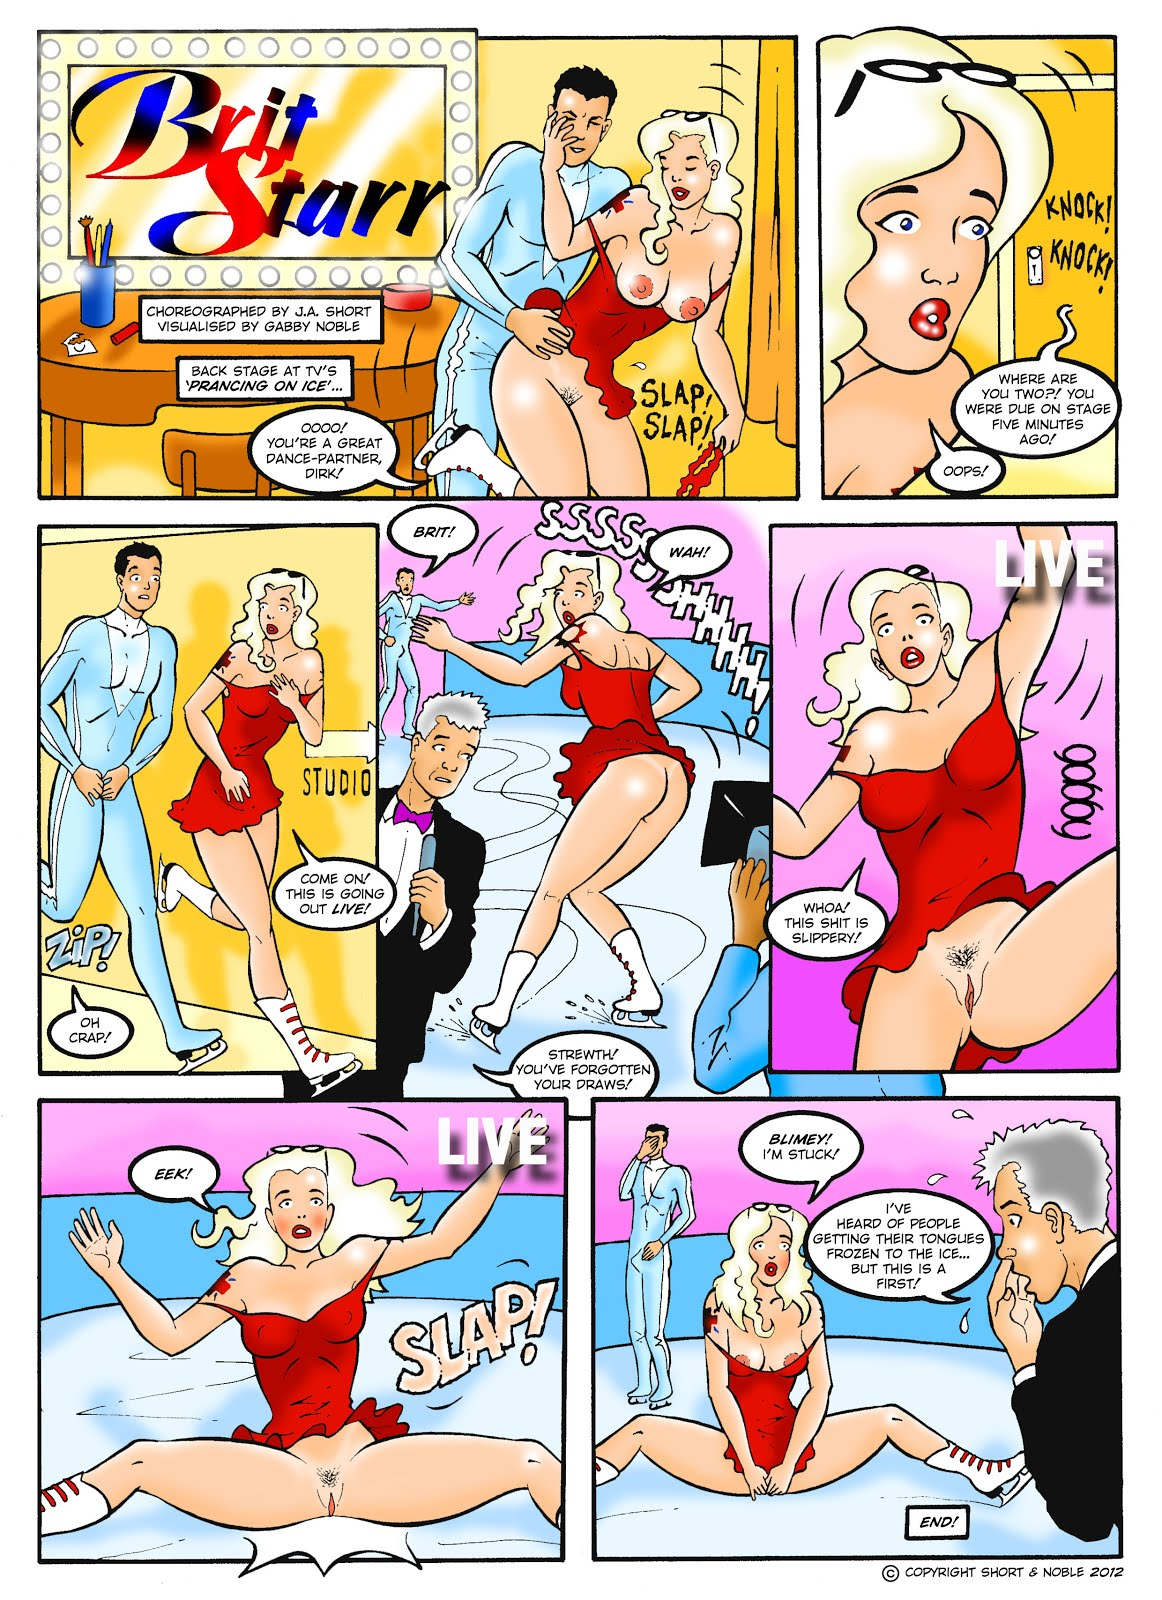 Pamela nude boobs